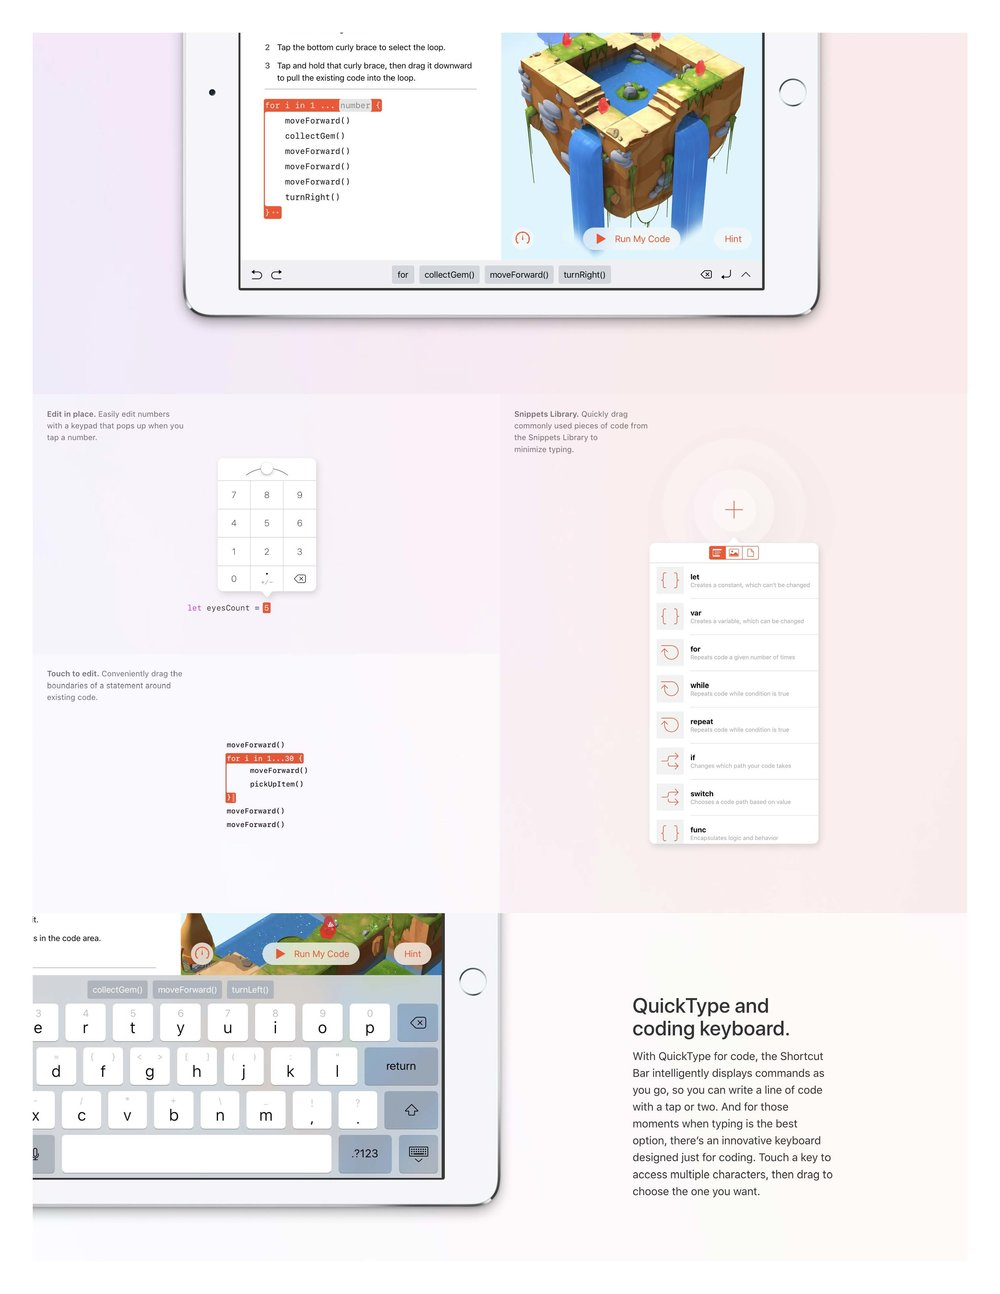 screencapture-apple-swift-playgrounds-2019-03-10-12_50_37_Page_6.jpg